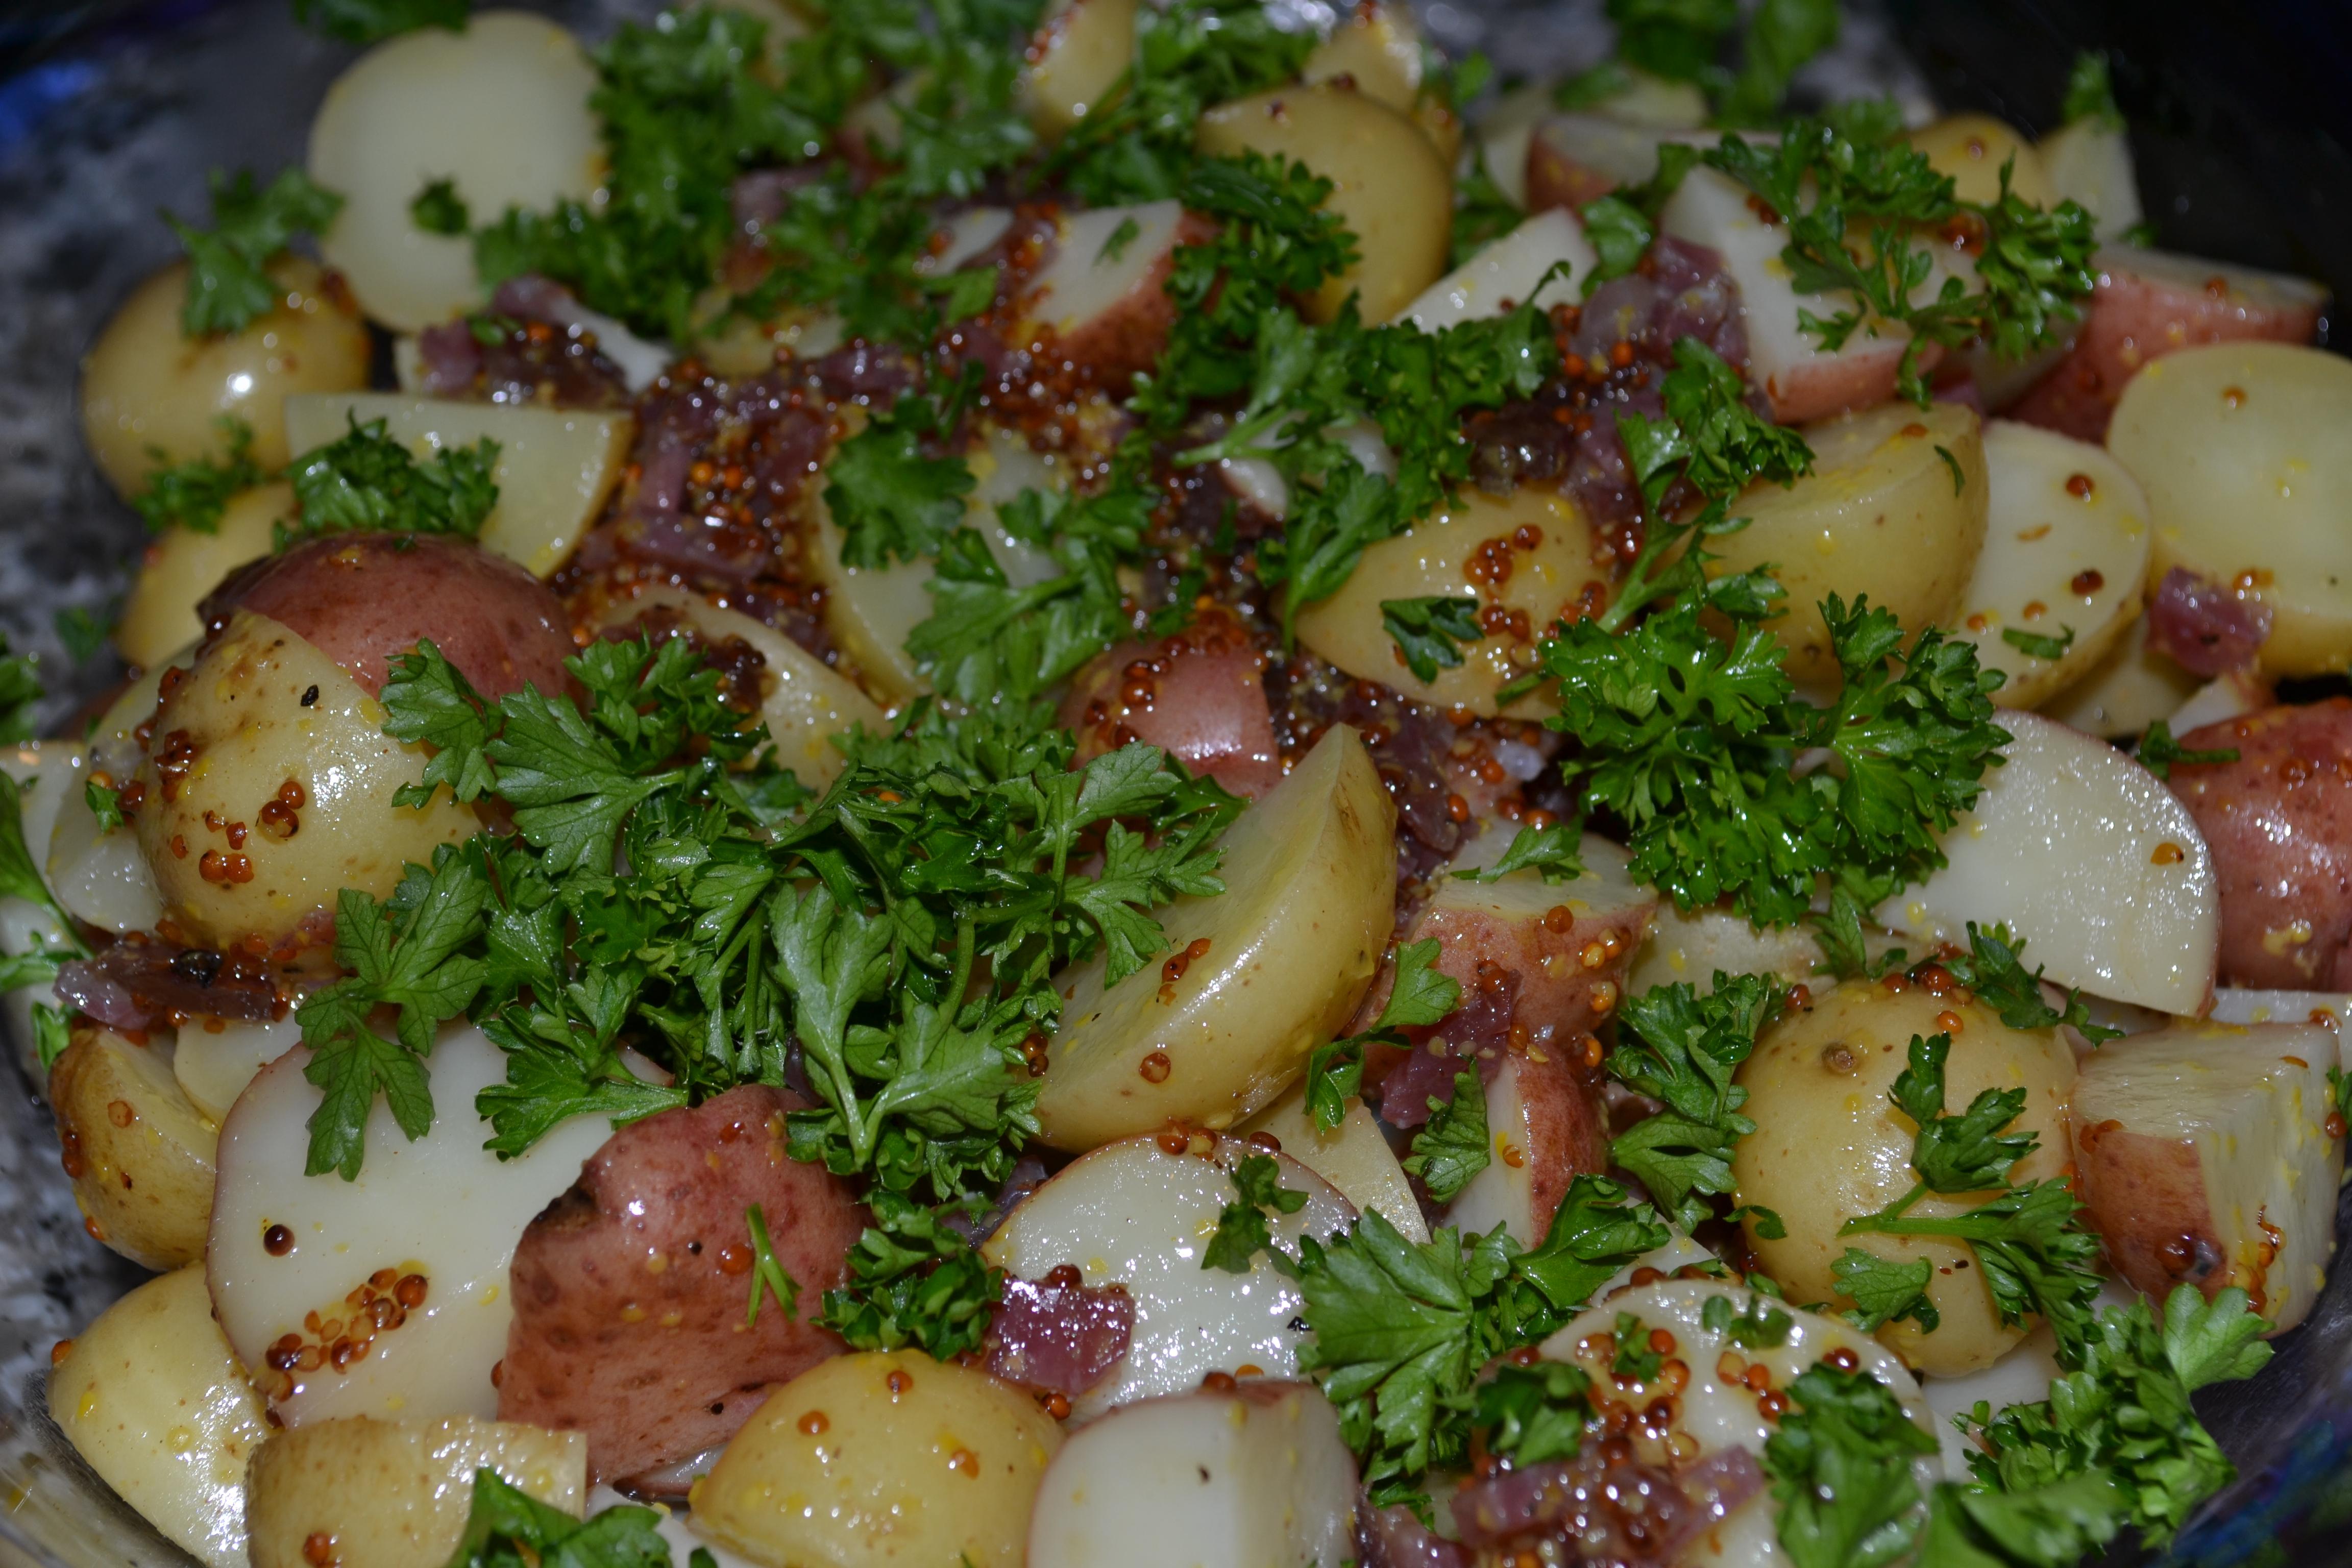 Better homes and gardens potato salad garden ftempo for Better homes and gardens potato salad